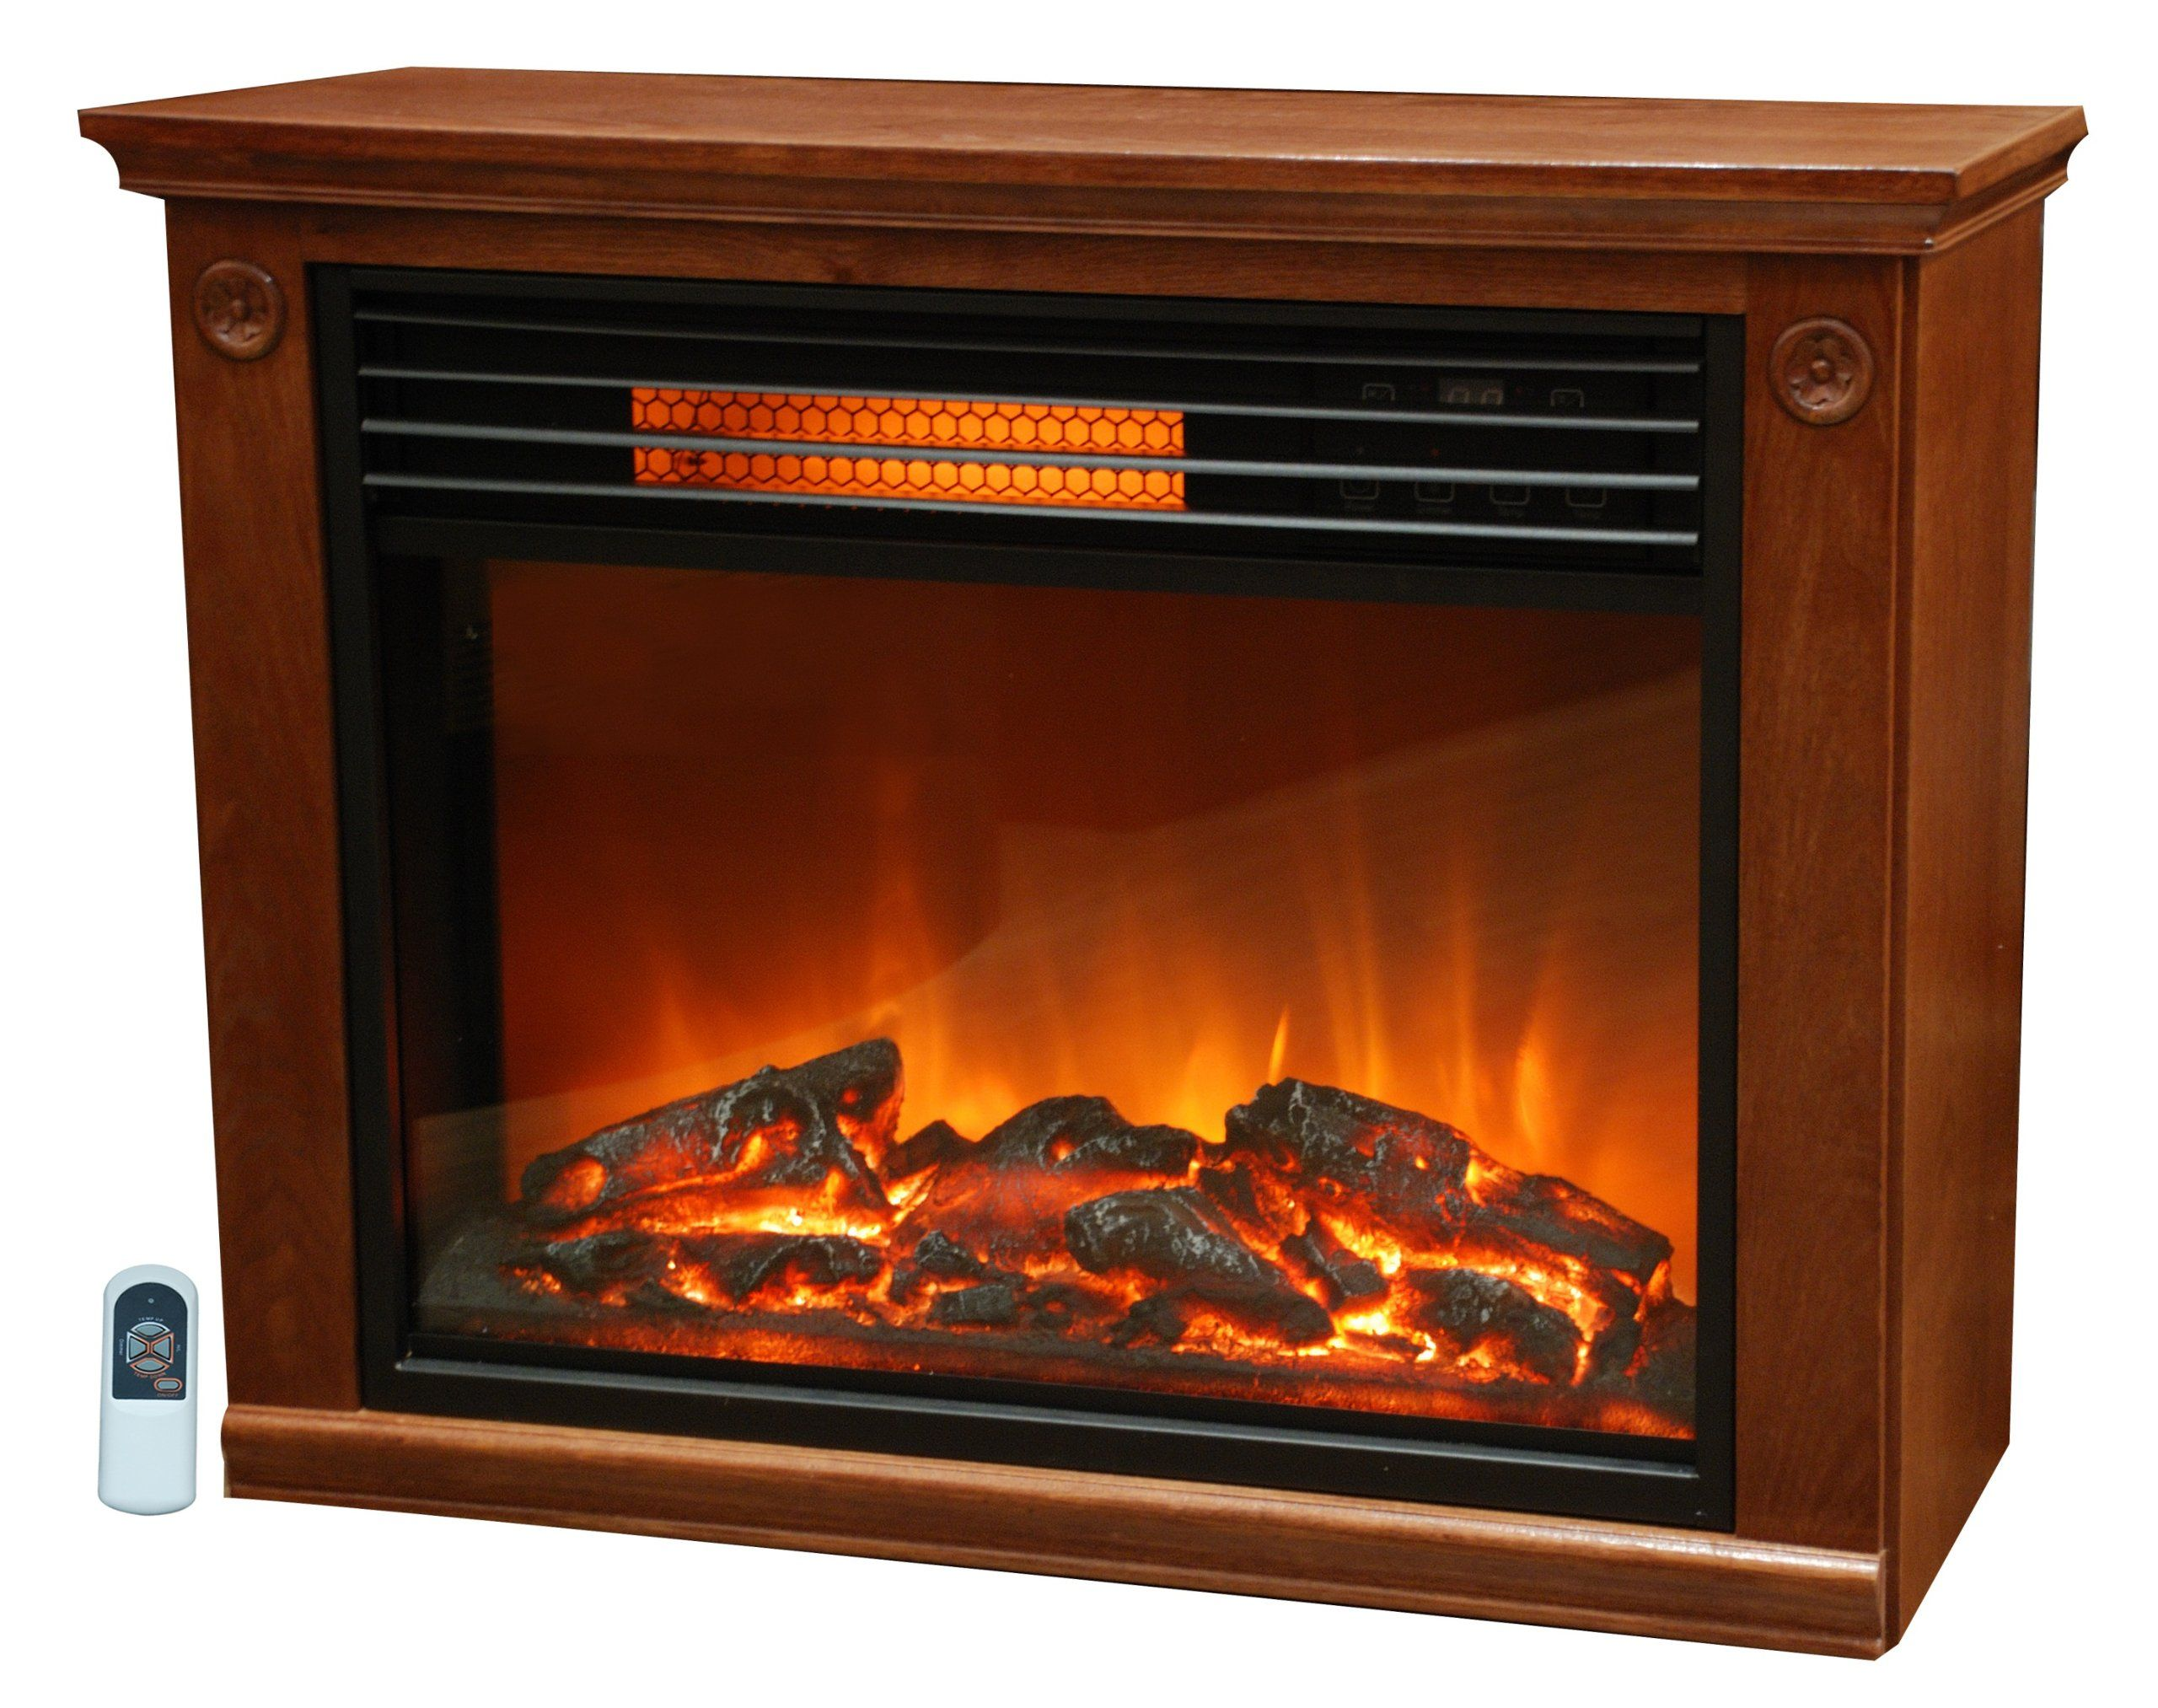 Lifesmart Products Ls2001frp13 Infared Fireplace 1500 Watt